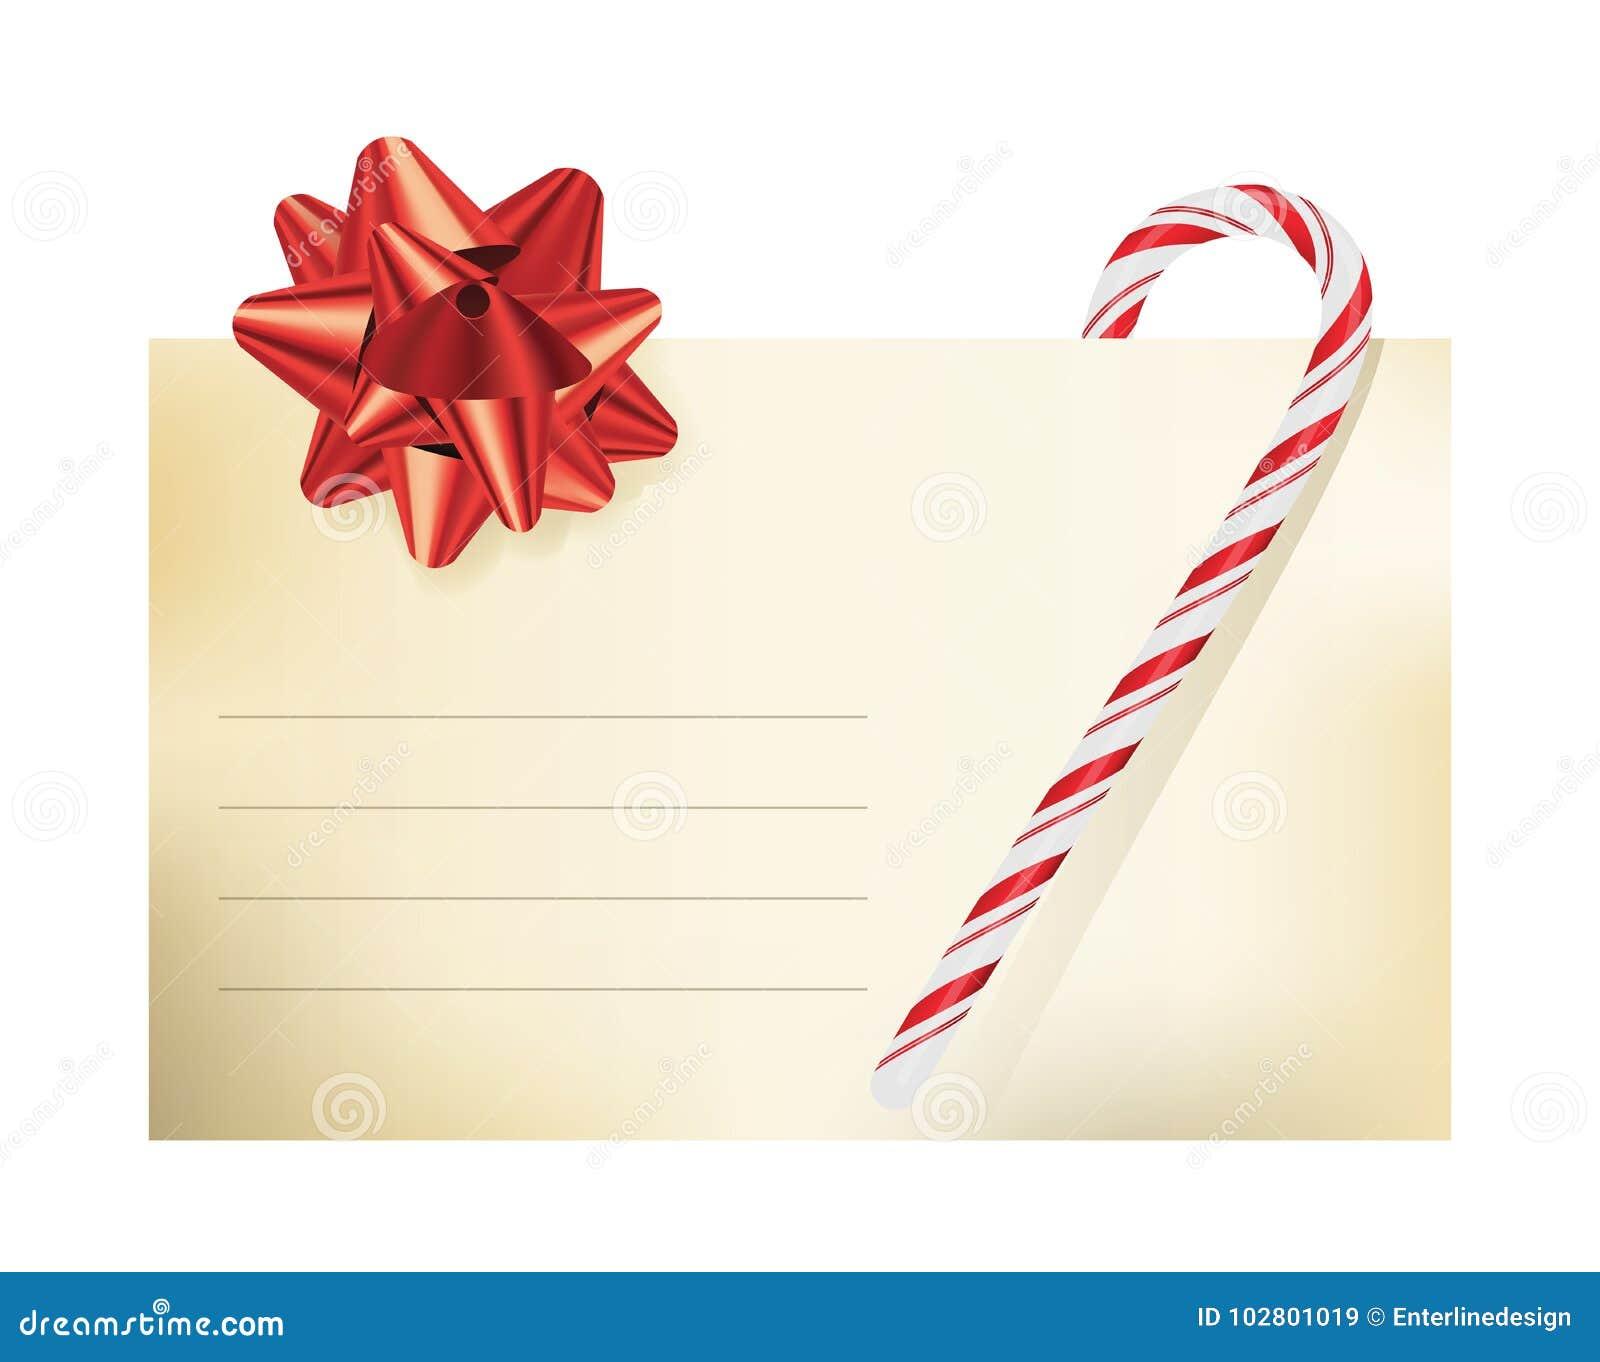 christmas themed blank note card illustration stock vector